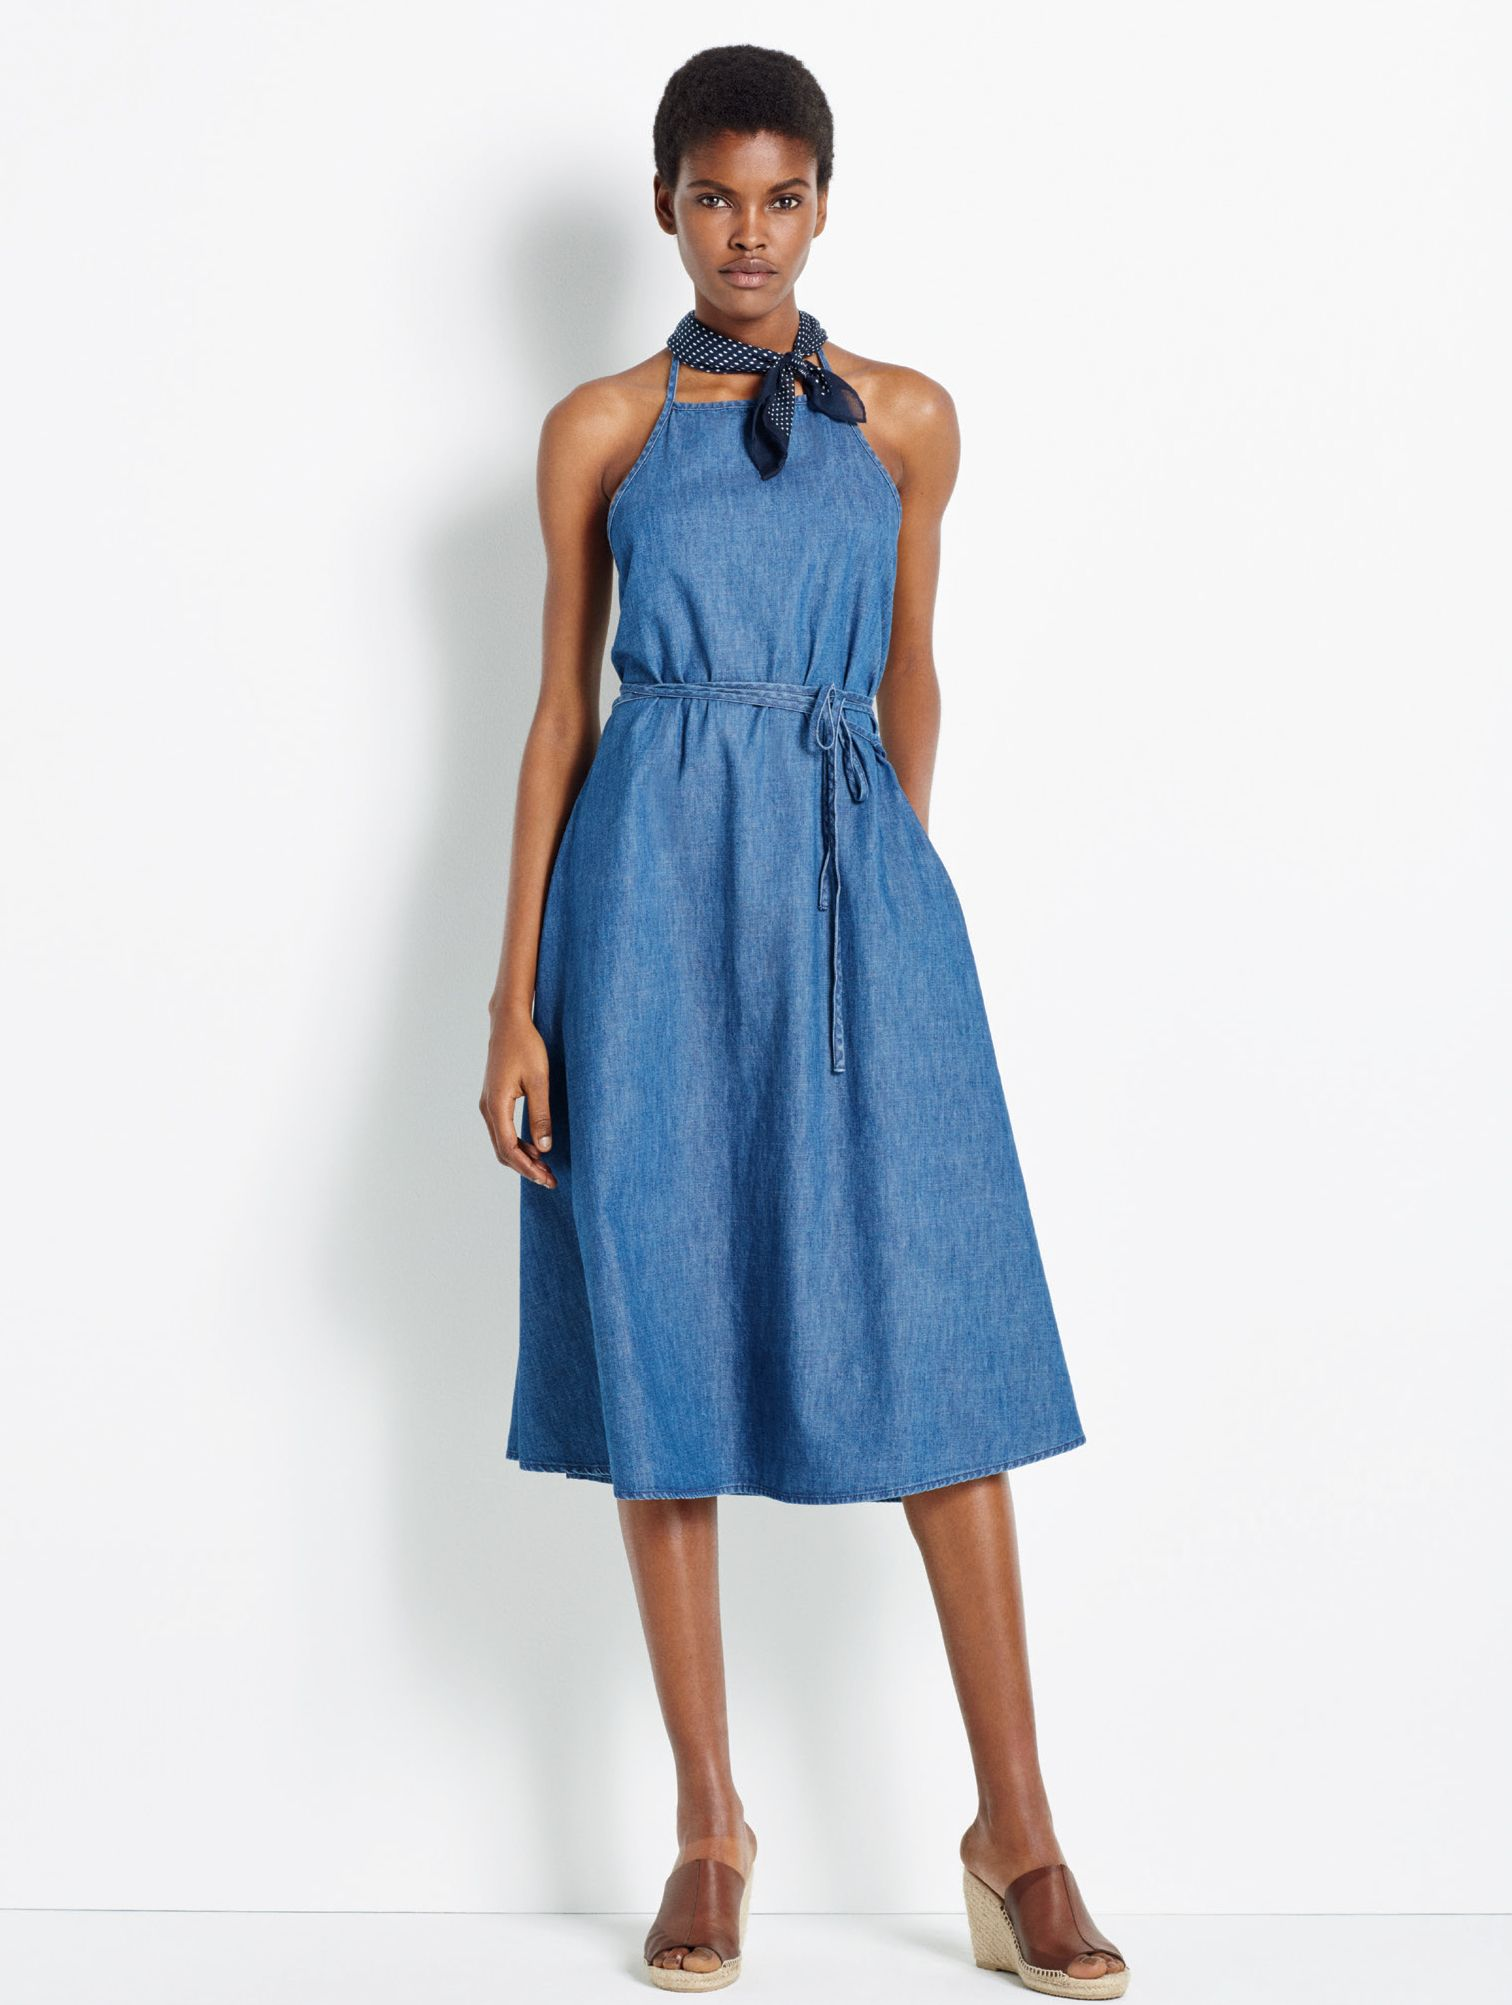 Abbie De Castro Denim Designer Gap Womens Denim Summer 2016 Lookbook Summer Dresses For Women Summer Dresses Denim Women [ 2005 x 1512 Pixel ]